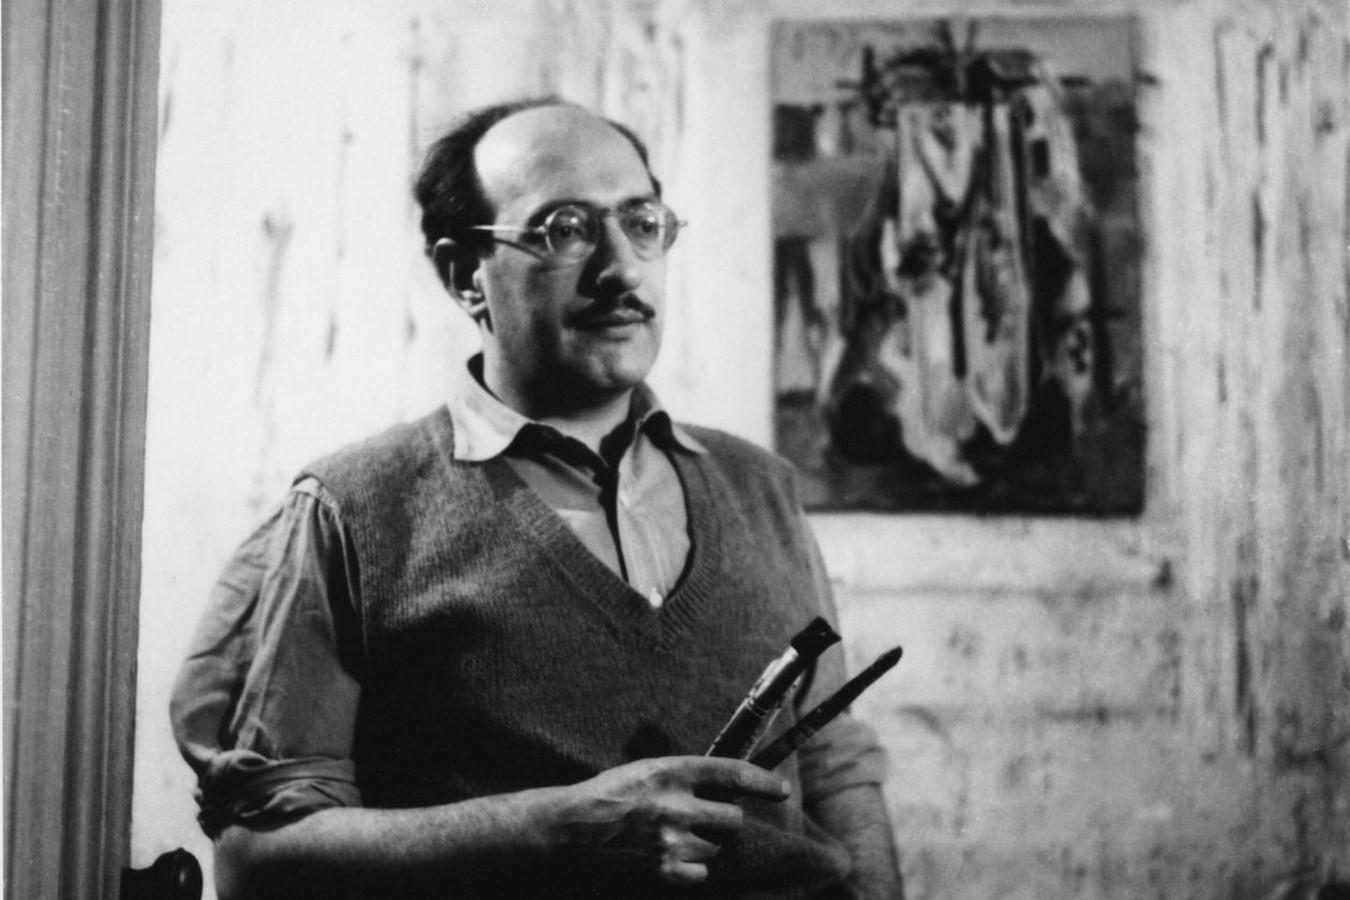 Life of an Artist Mark Rothko - Sheet8